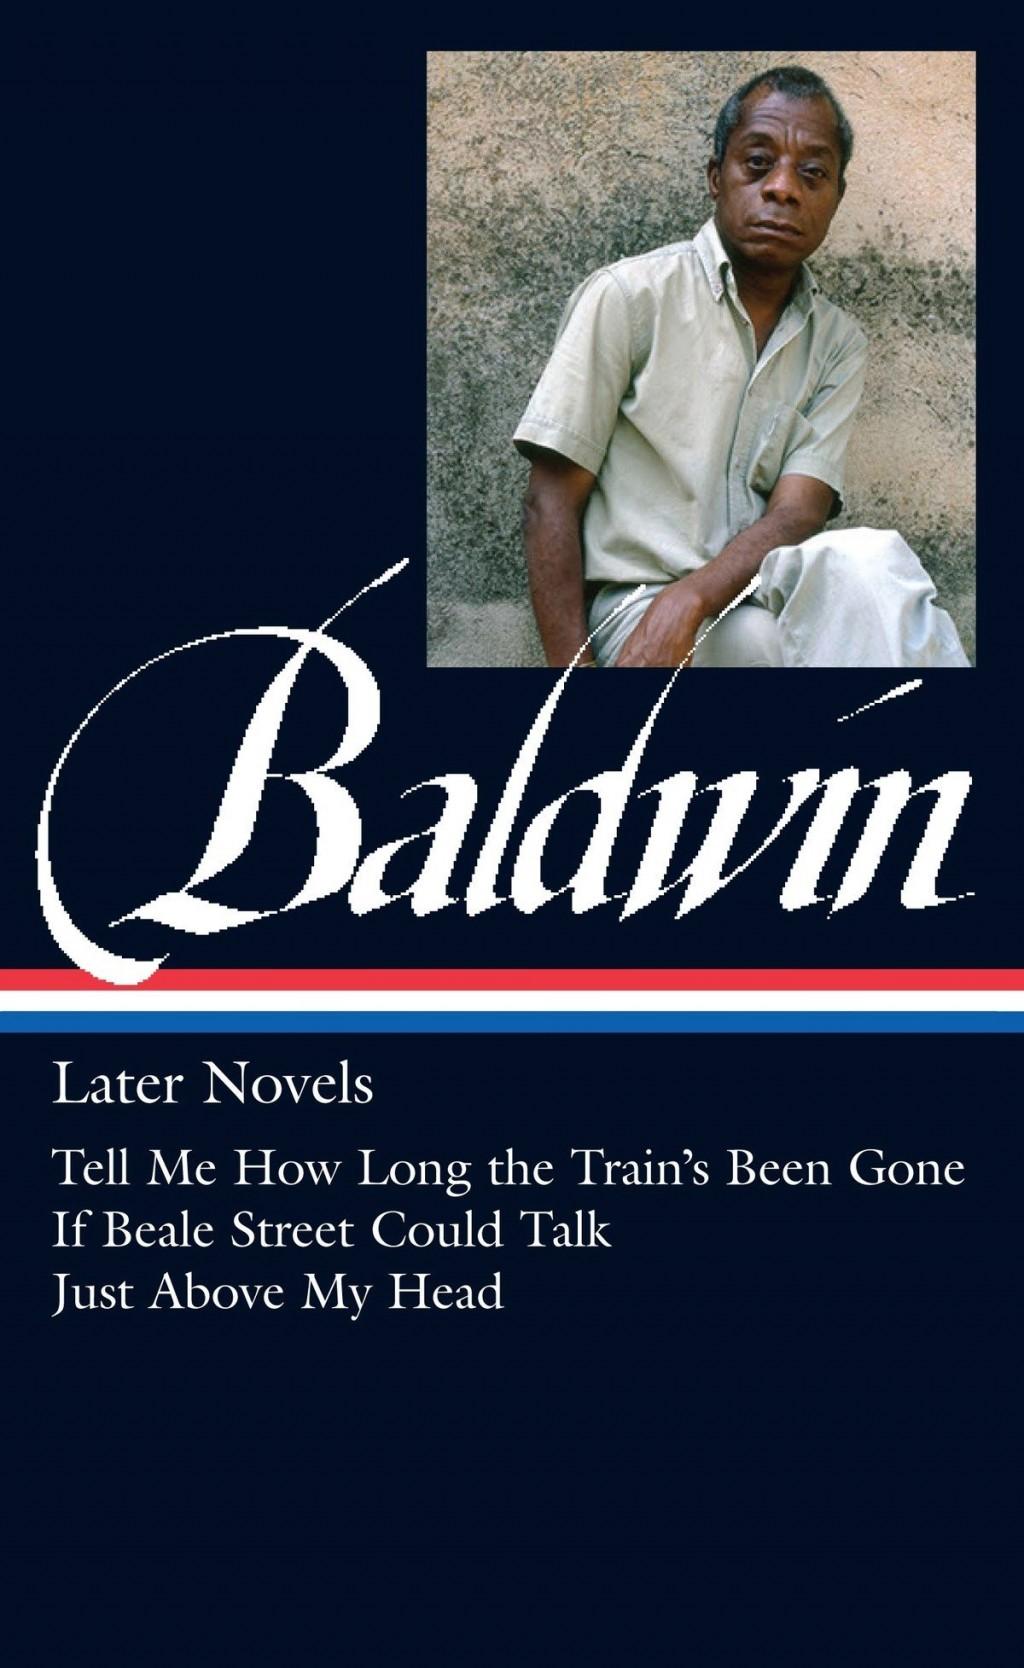 022 James Baldwin Collected Essays 81v0yxj44el Essay Wondrous Table Of Contents Ebook Google Books Large